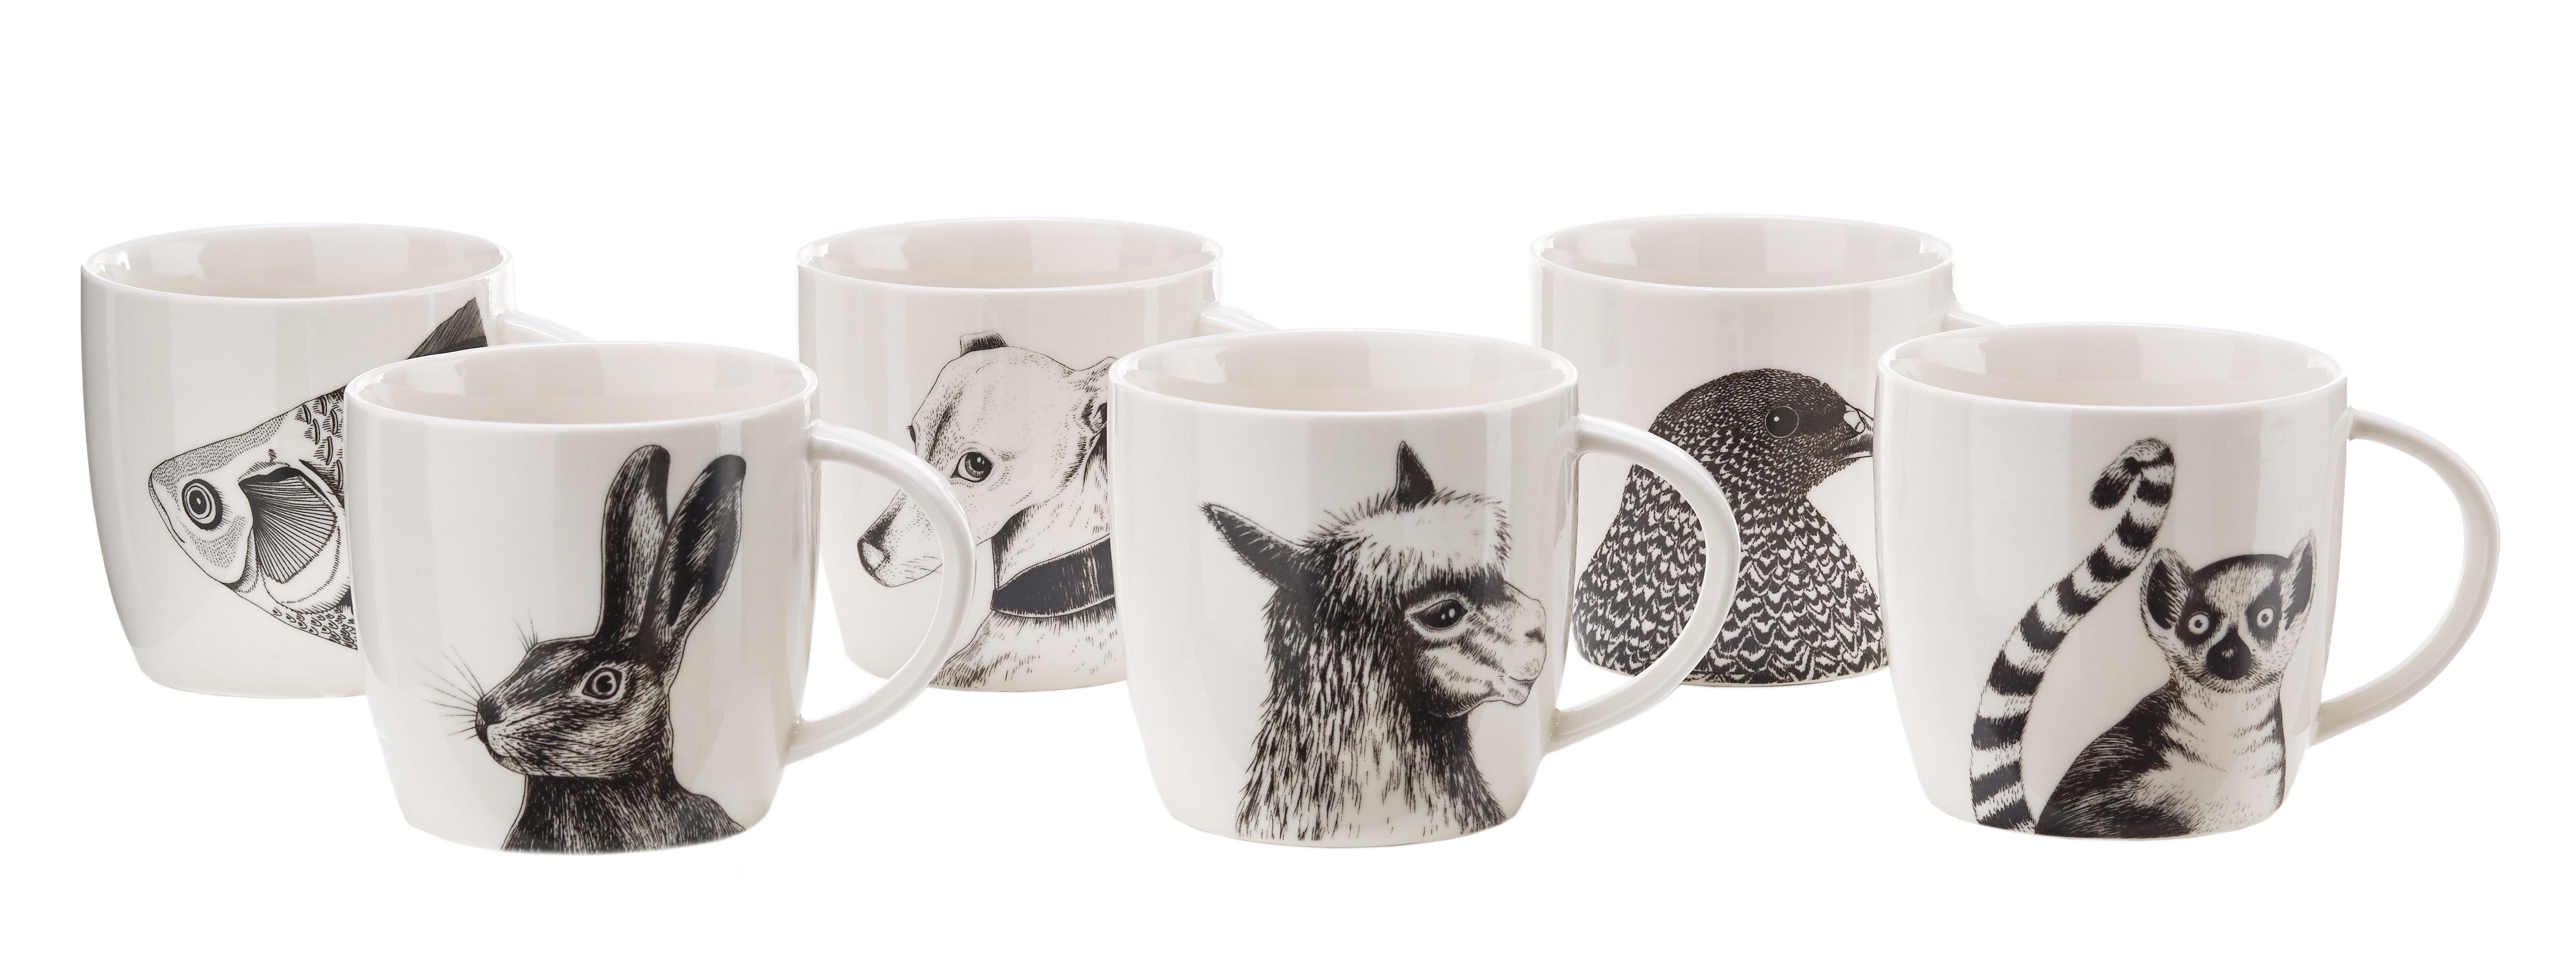 Tableware - Coffee Mugs & Tea Cups - Animals Mug - / Set of 6 - Porcelain by Pols Potten - Black & white - Porcelaine vitrifiée